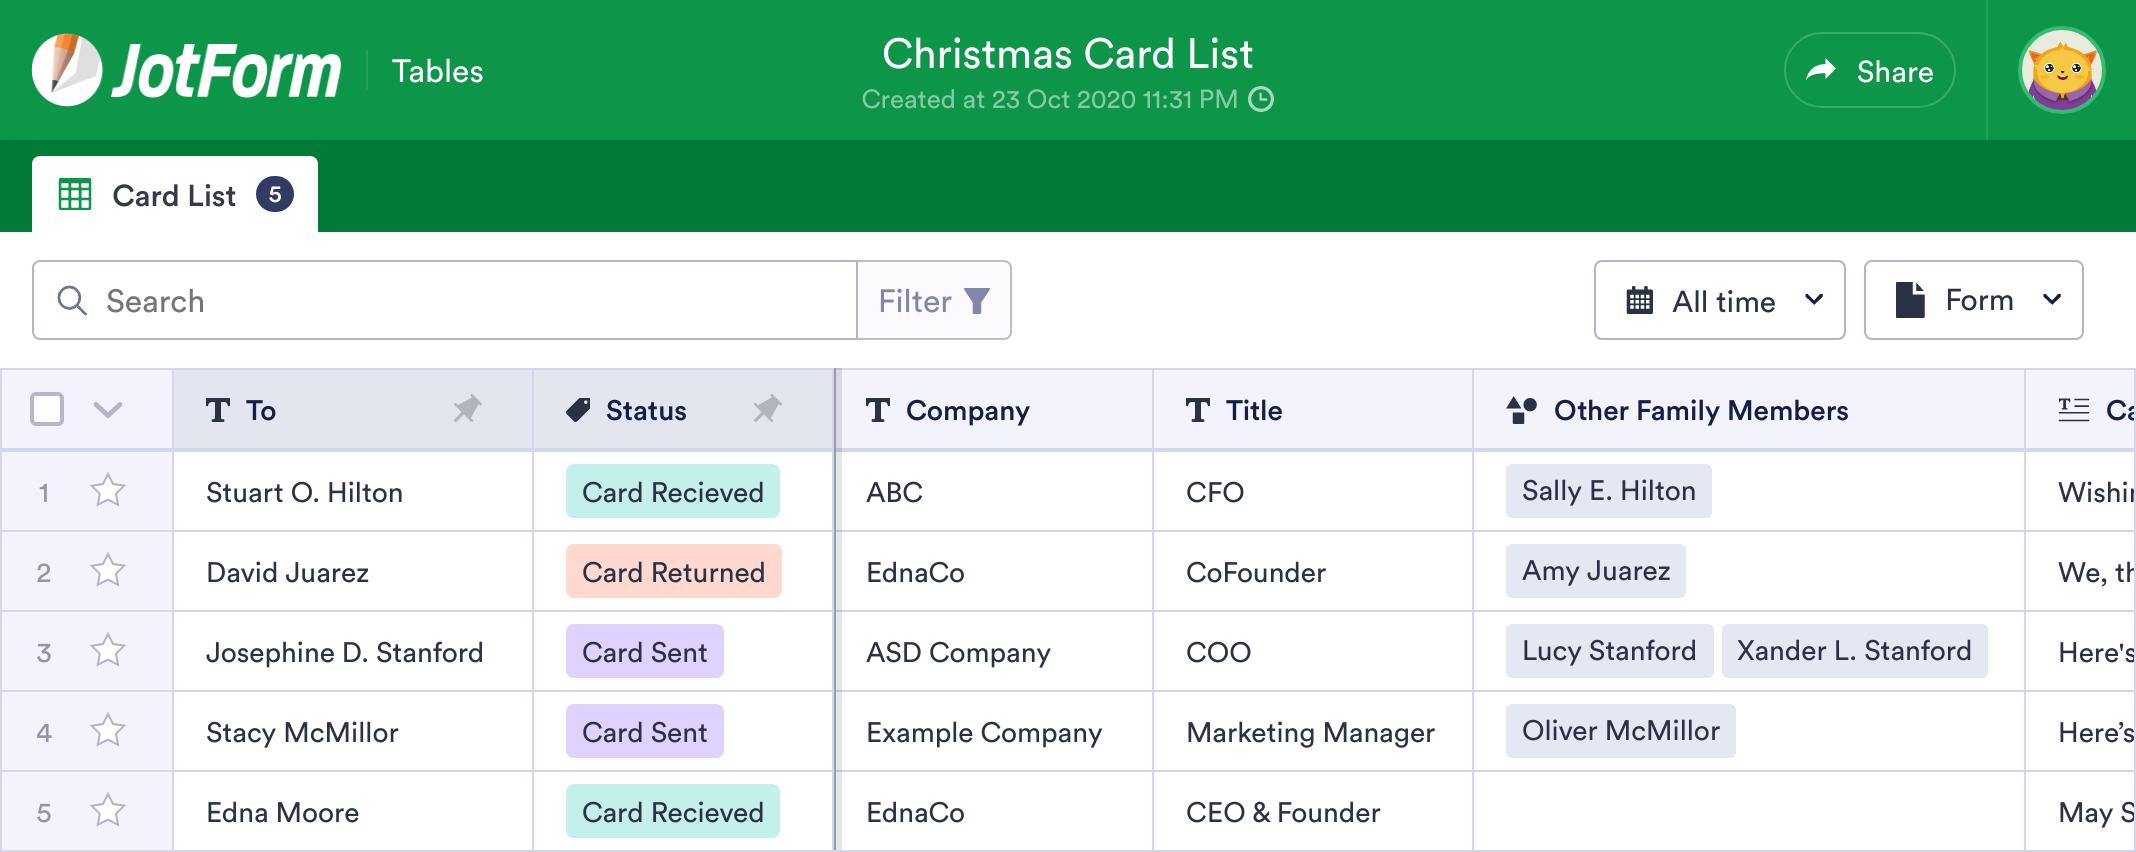 Christmas Card List Template Jotform Tables